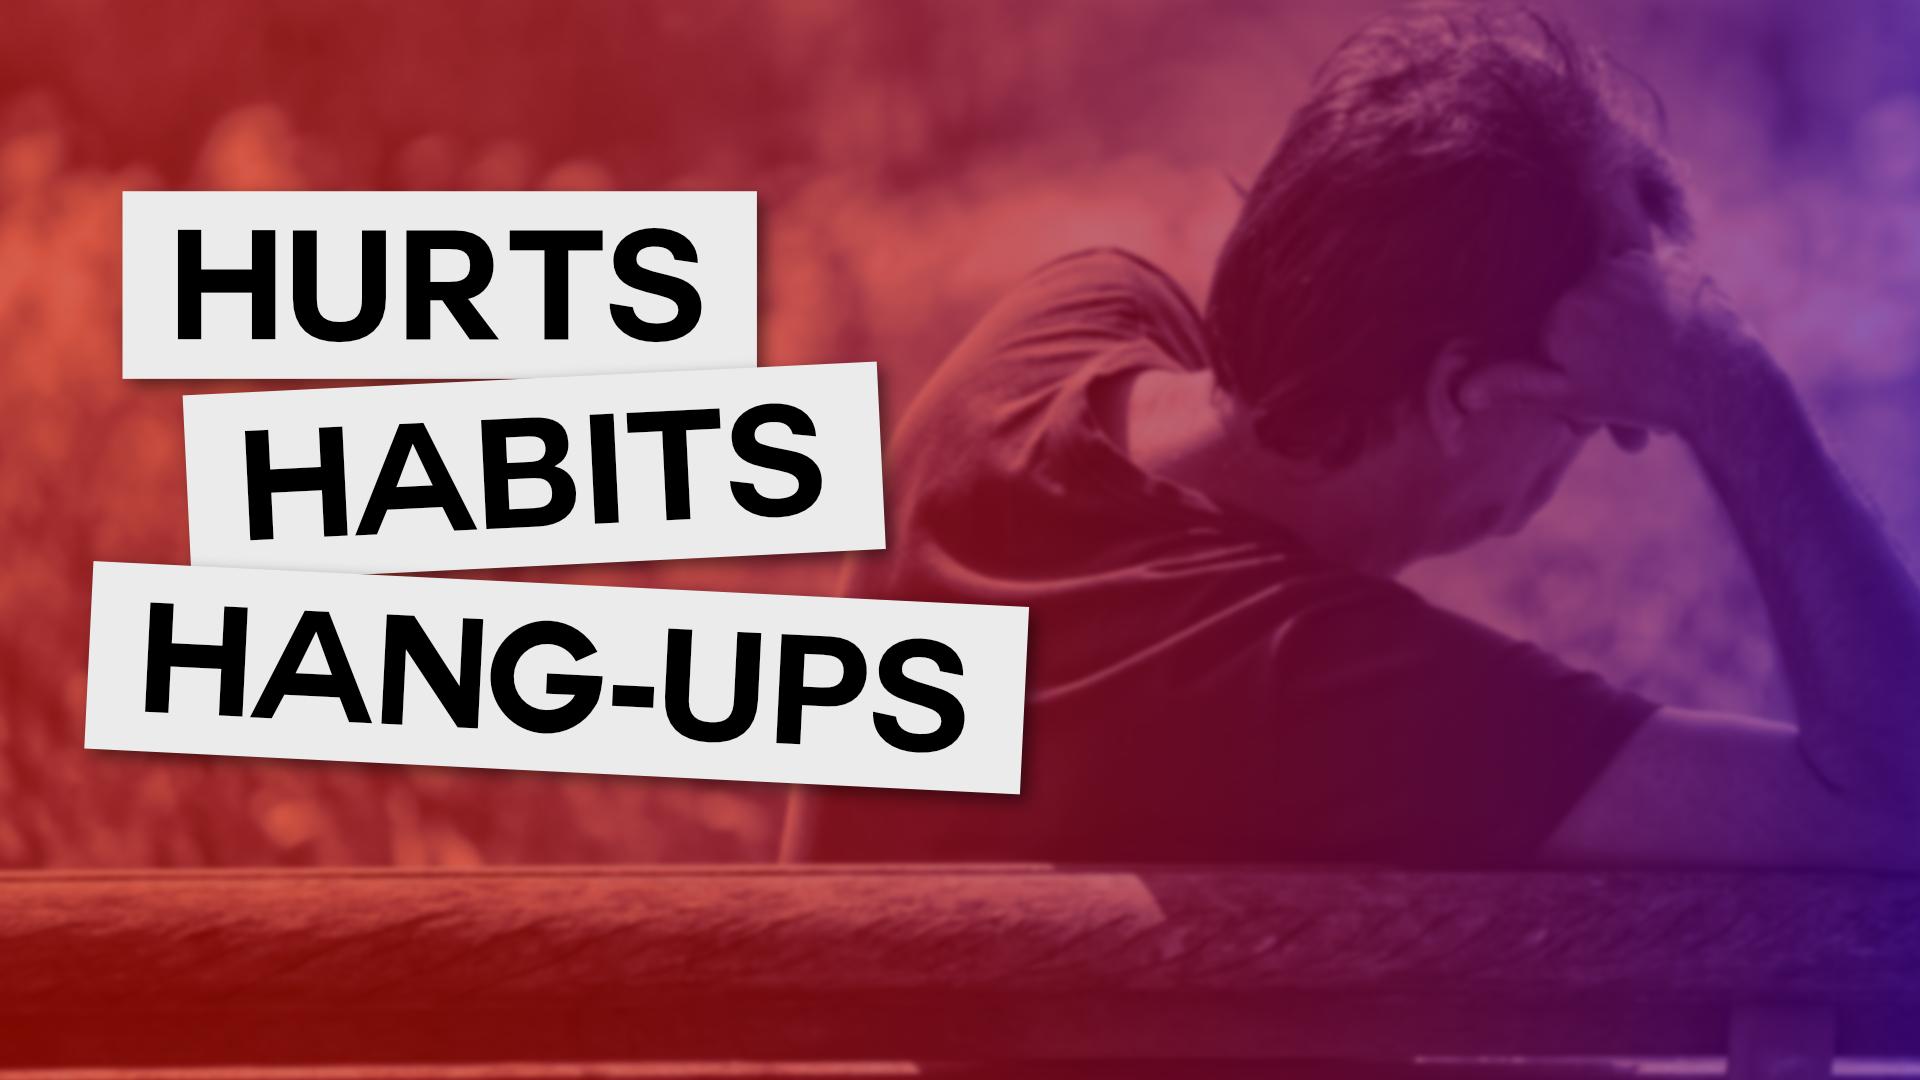 Hurts Habits and Hangups Series Graphic.jpg